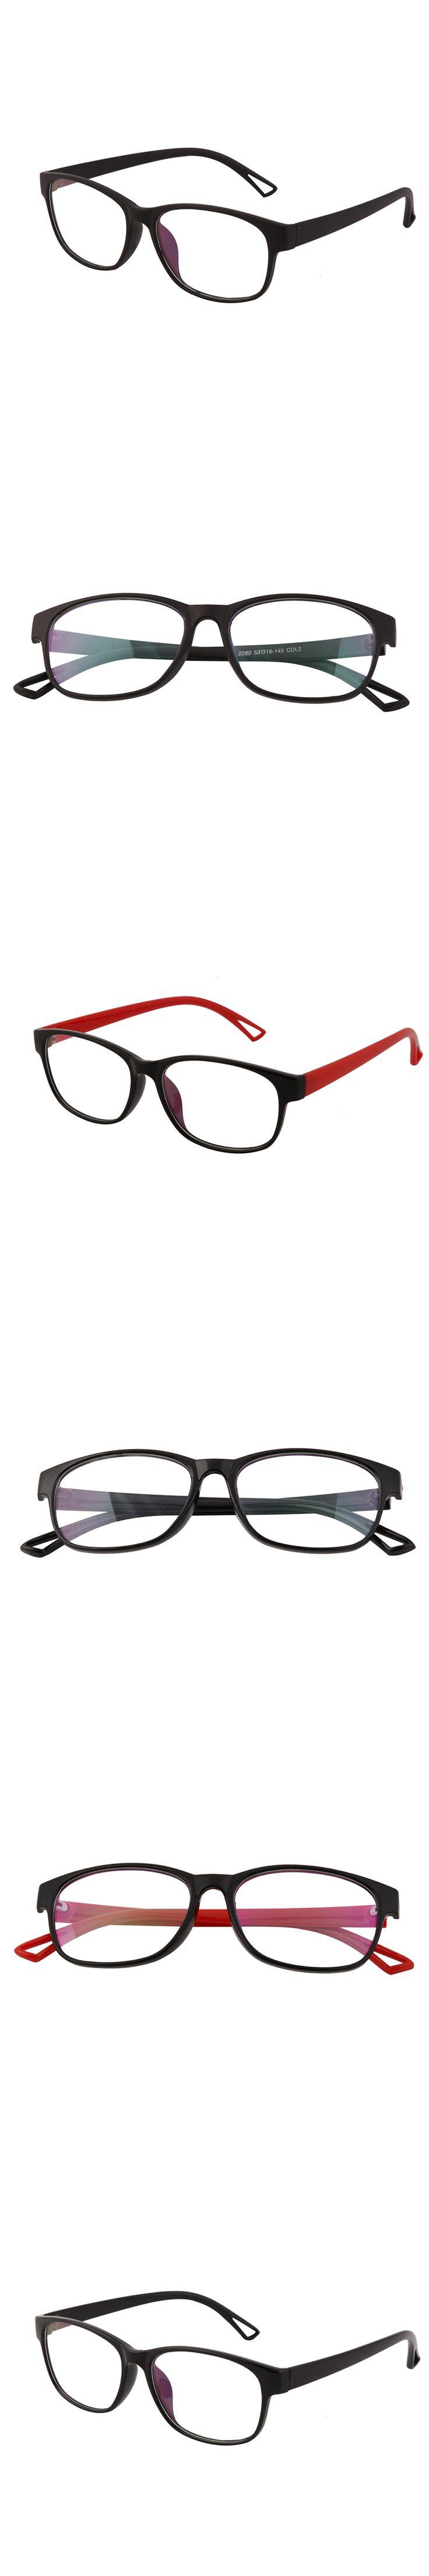 1x Prescription Reading Glasses Stylish Fashion Readers Eyeglasses Eyewear Mens Womens Full Rim +0.50 to +6.0 Lens Spectacles